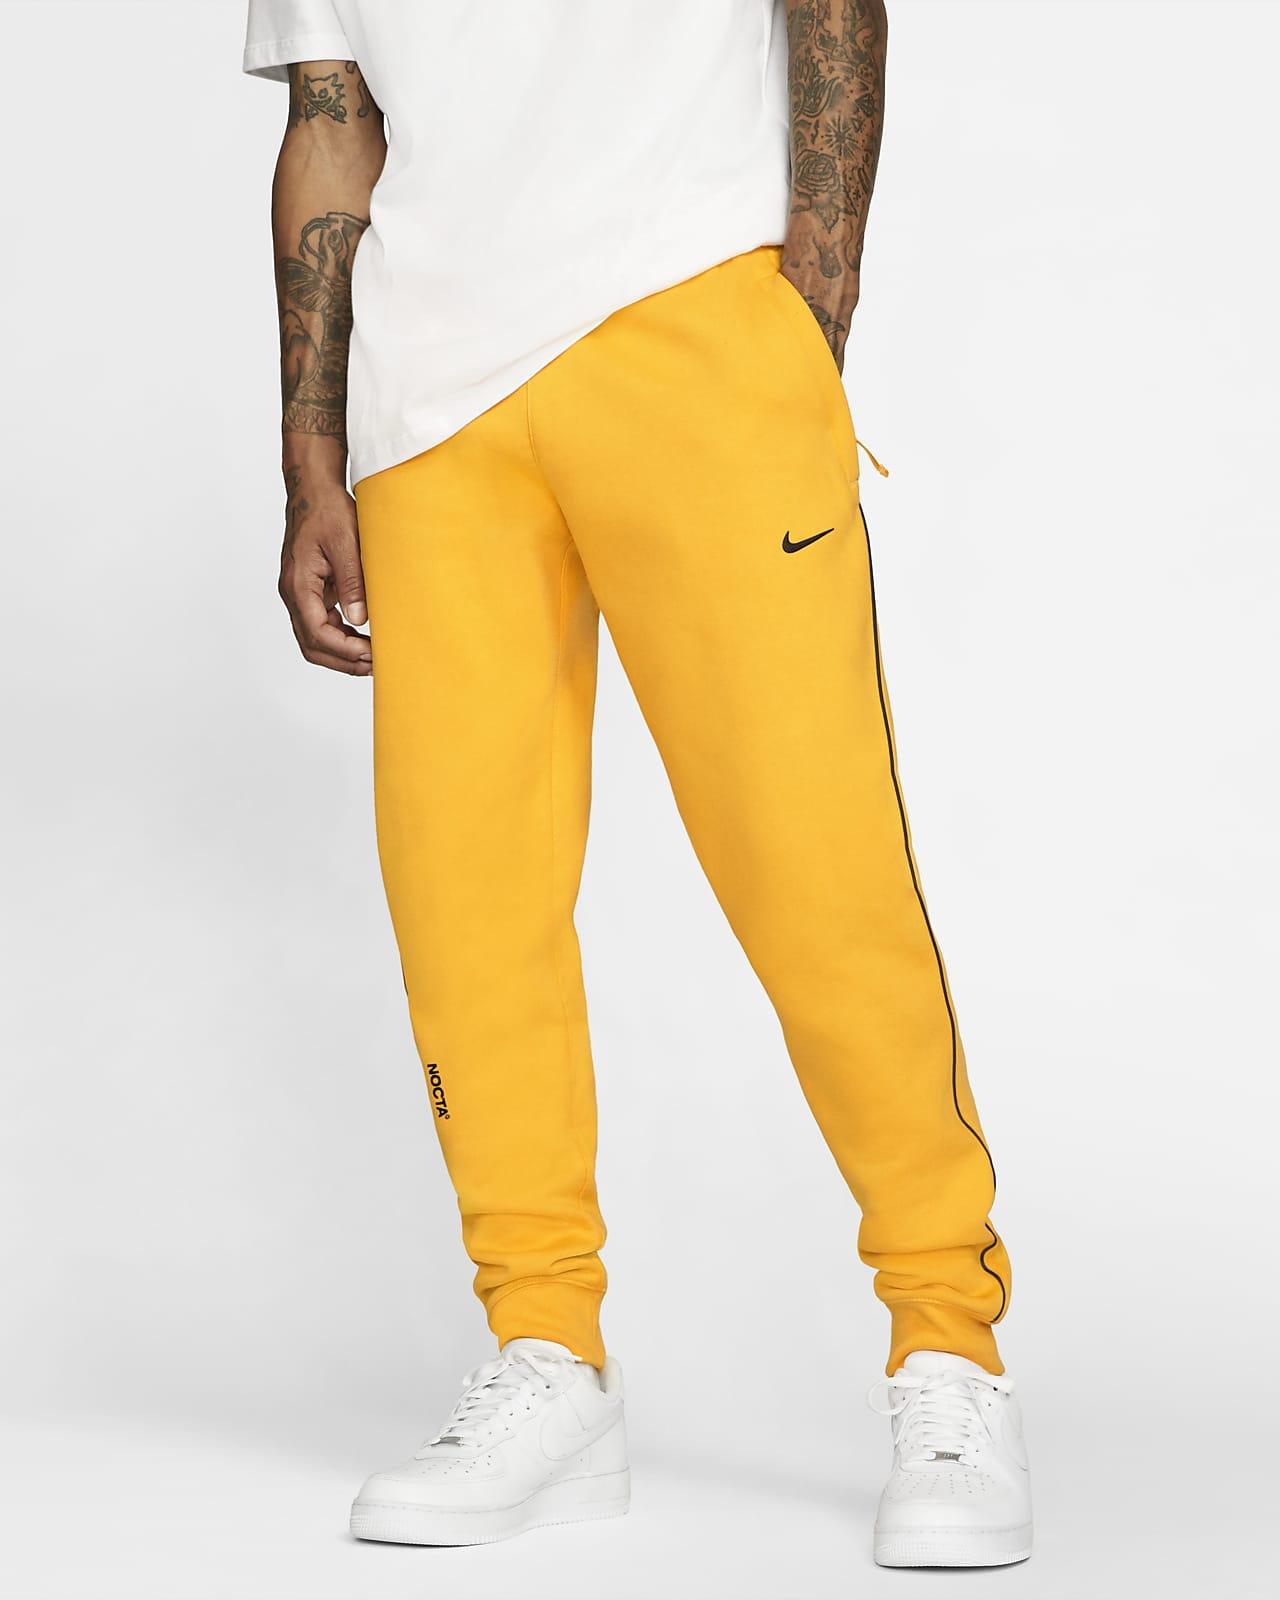 Drake Nike NOCTA University Gold Fleece Pants